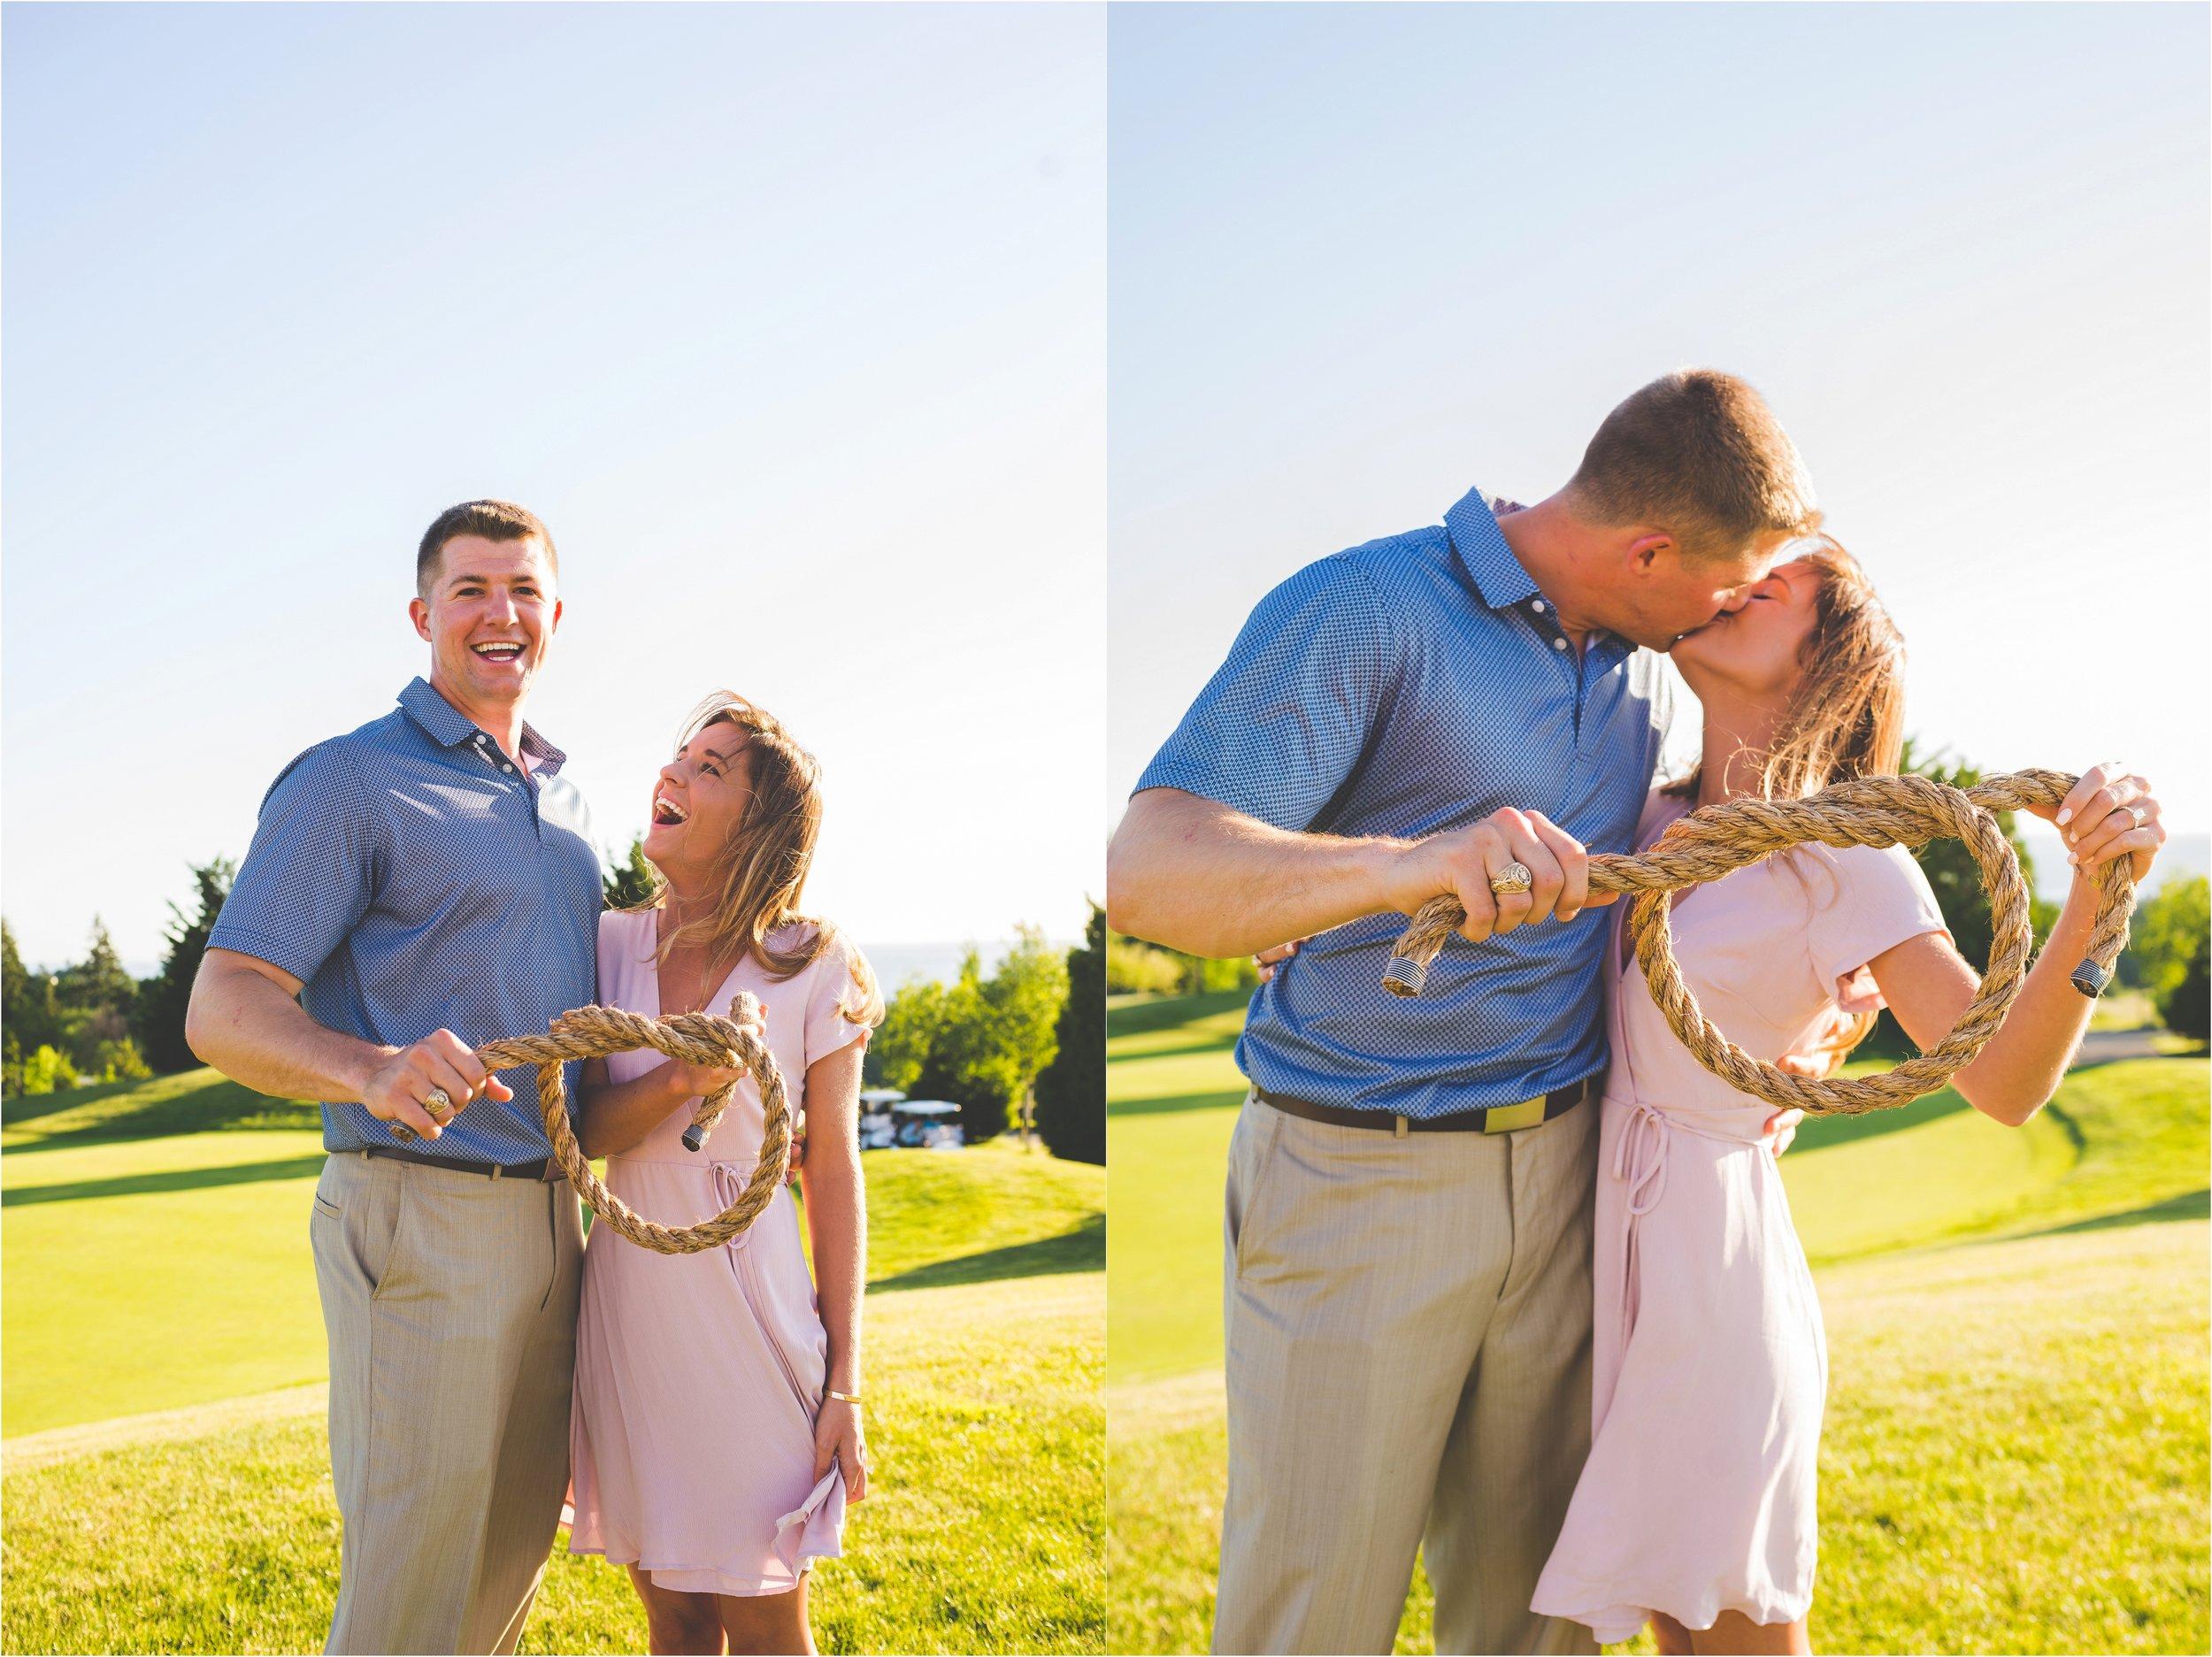 newcastle-golf-club-proposal-jannicka-mayte-seattle-washington-engagement-wedding-photographer_0018.jpg